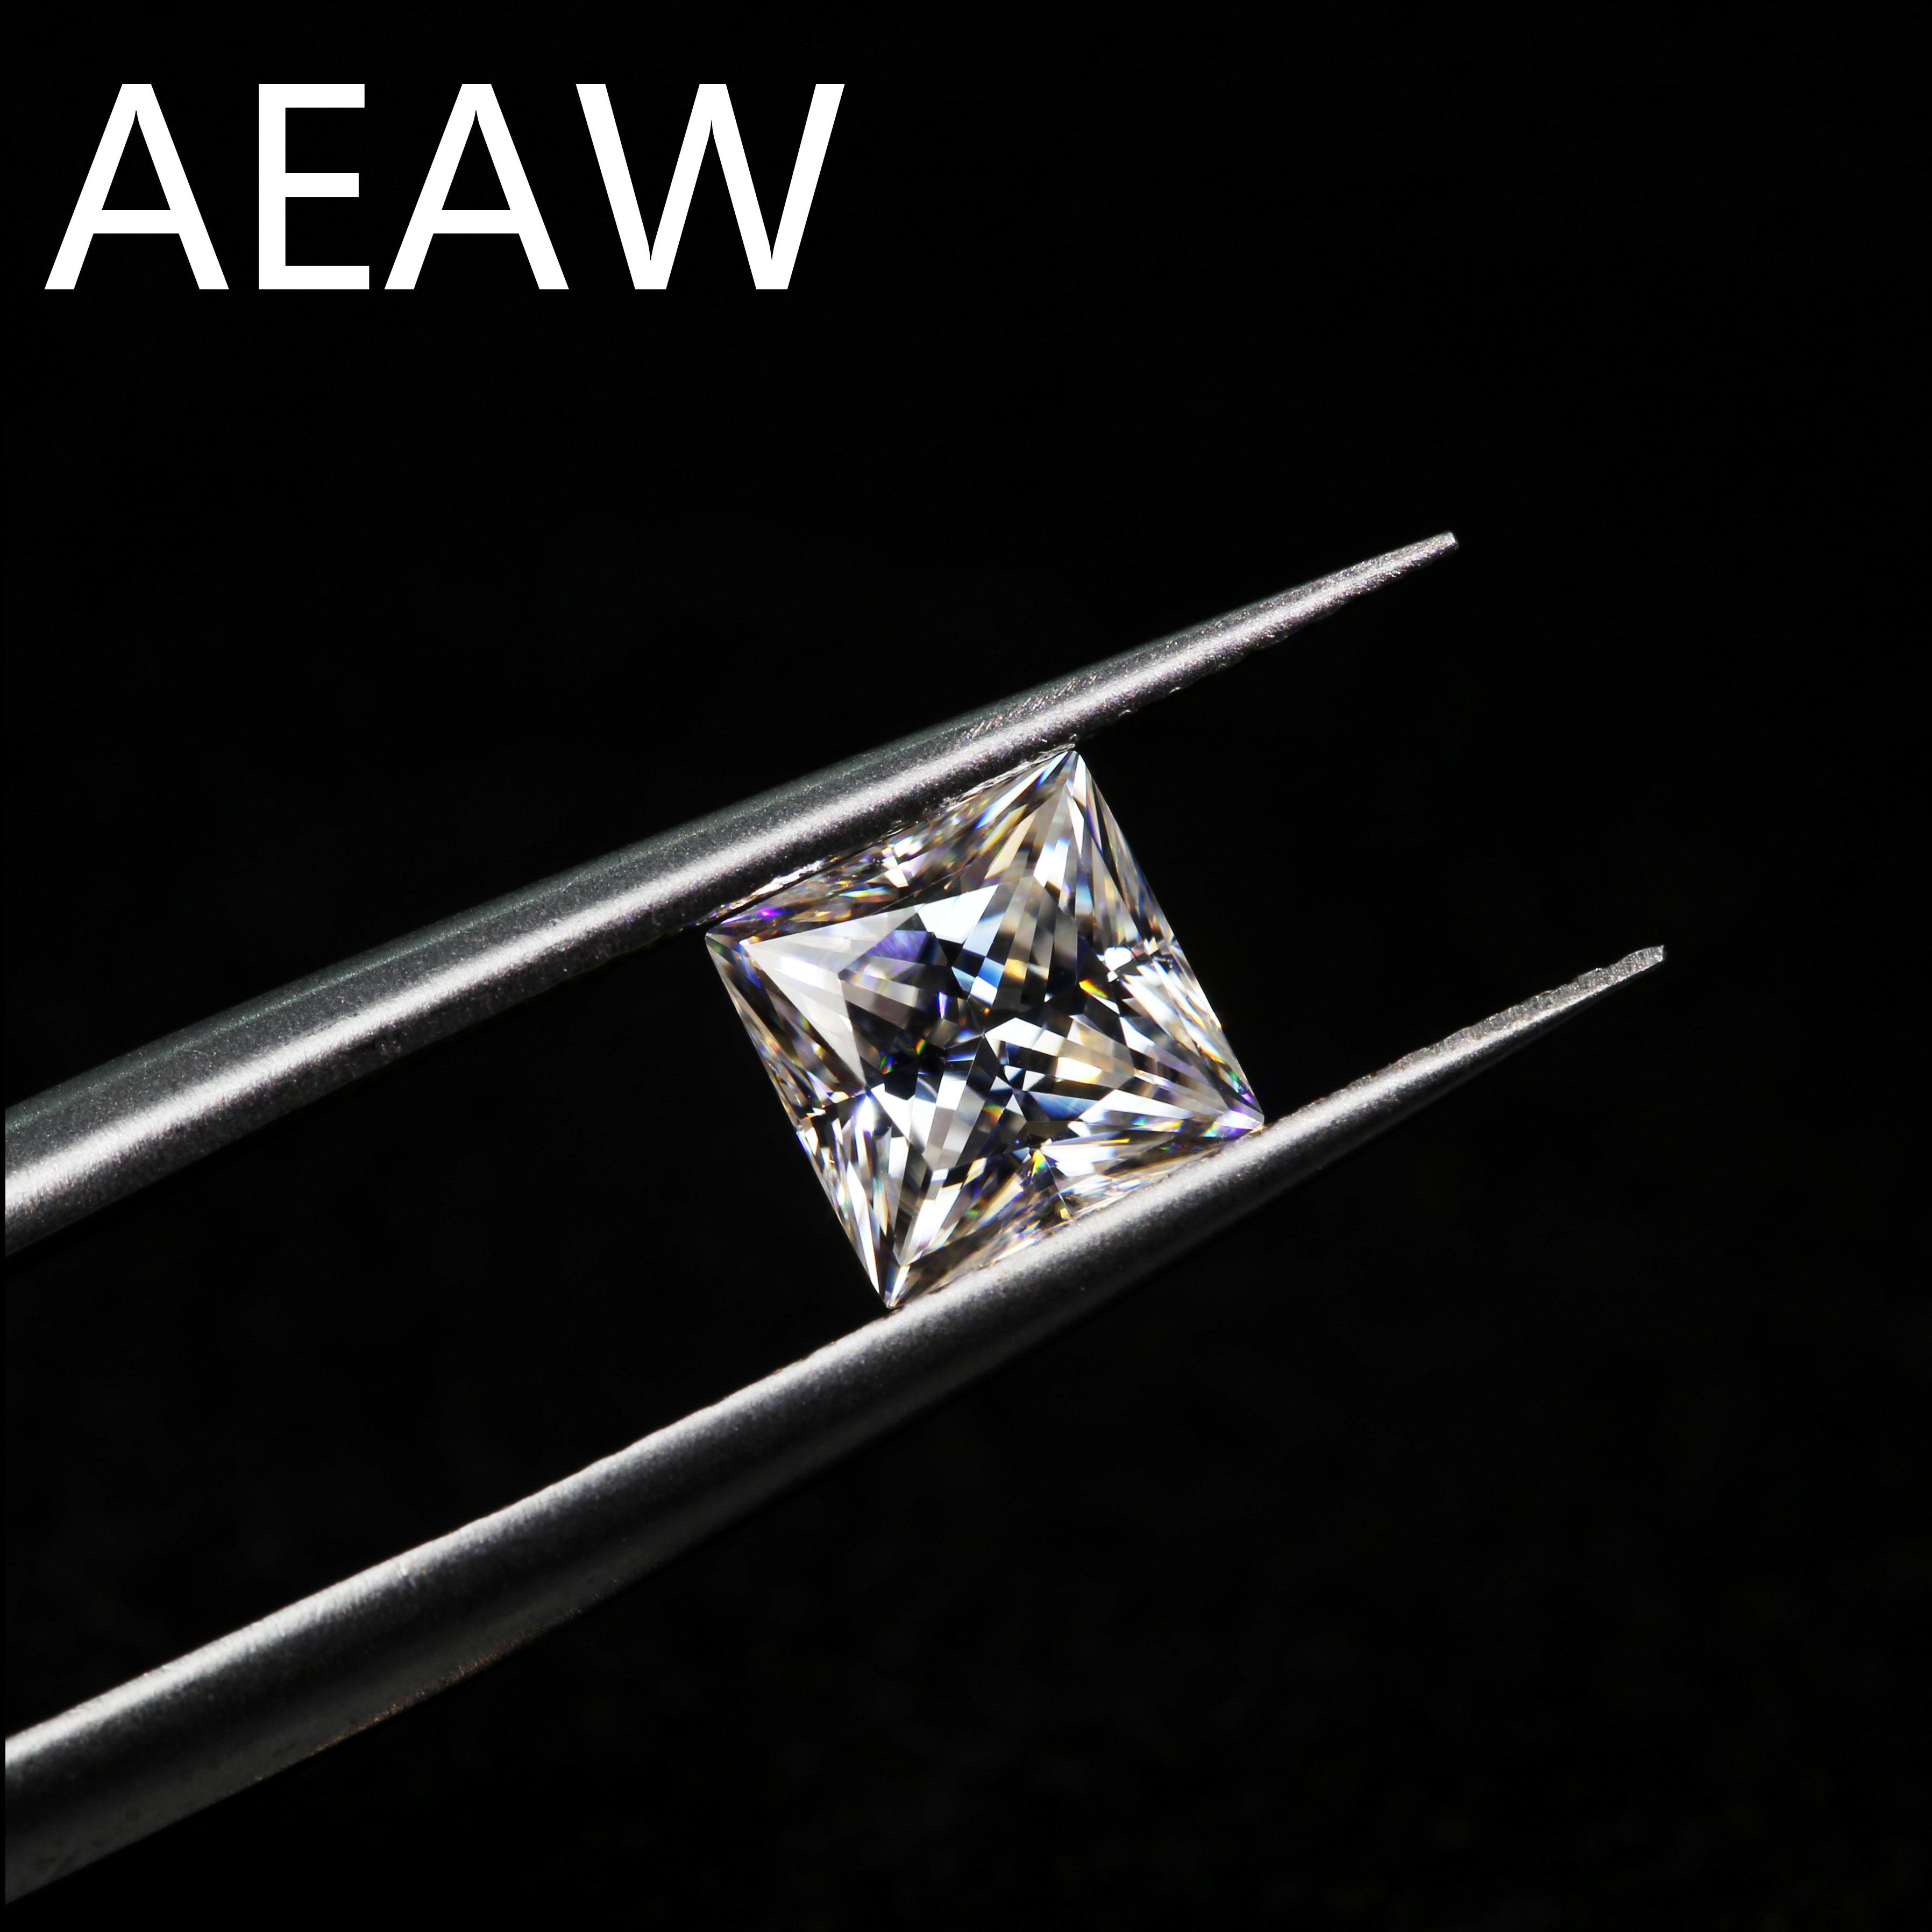 Loose-Stone Positive Moissanite Excellent-Cut Carat Grade-Test Princess-Cut 6mm 1ct Colvard